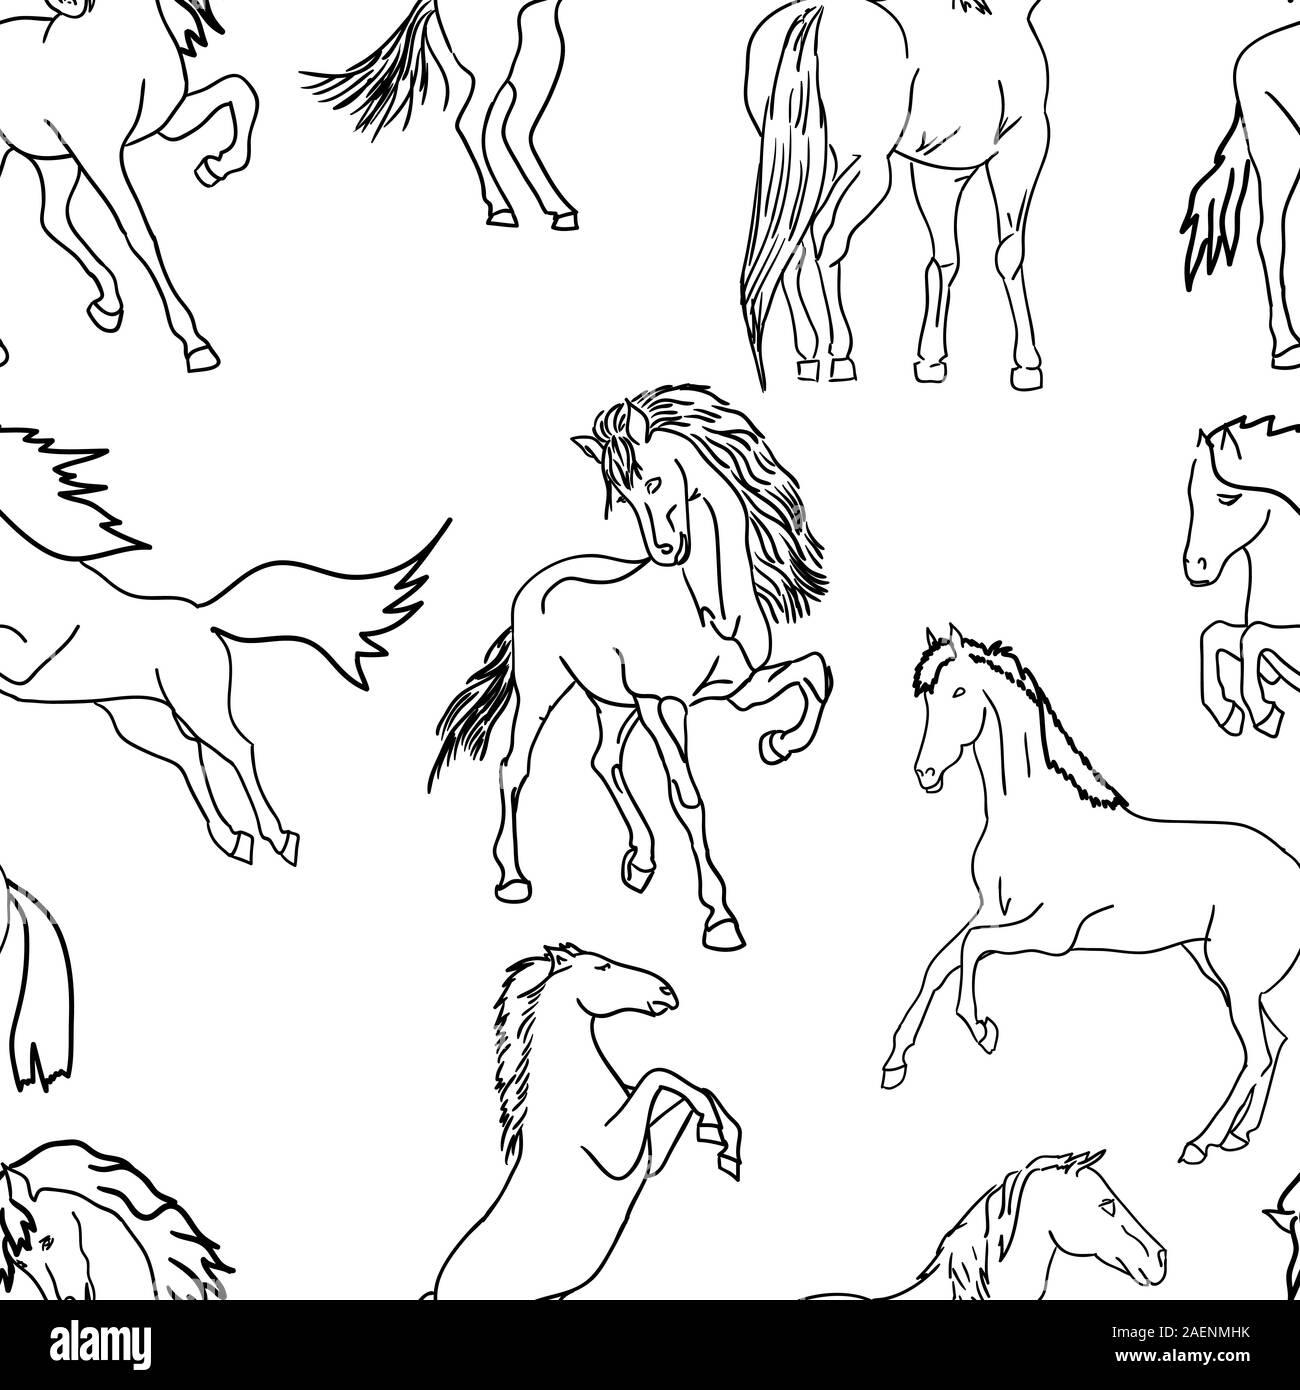 Seamless Wallpaper Horses Vector Illustration Stock Vector Image Art Alamy